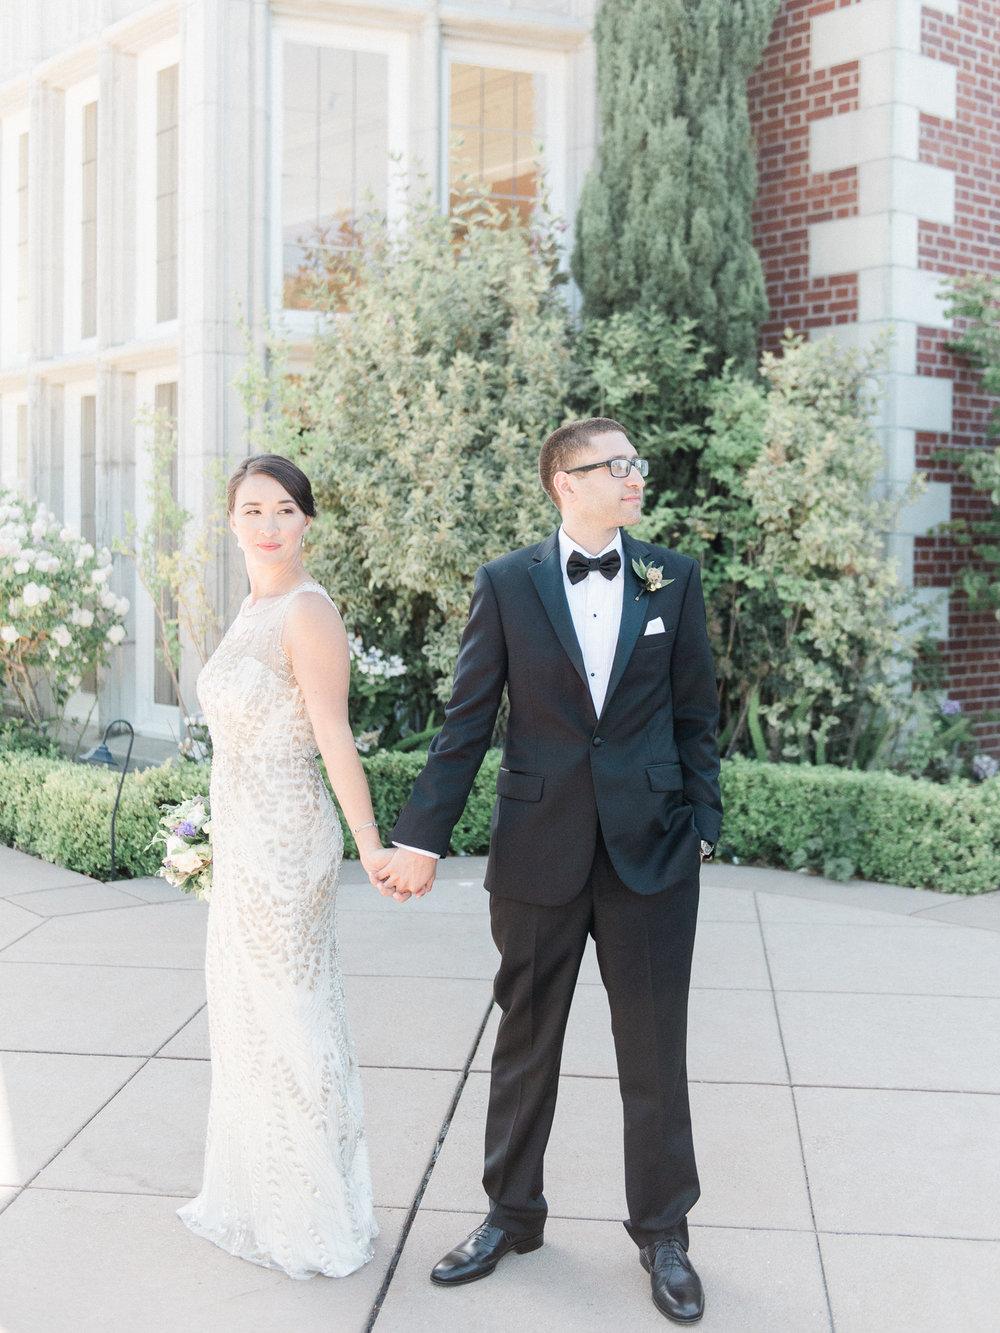 Sarah+Warren_wedding_spp-2.jpg